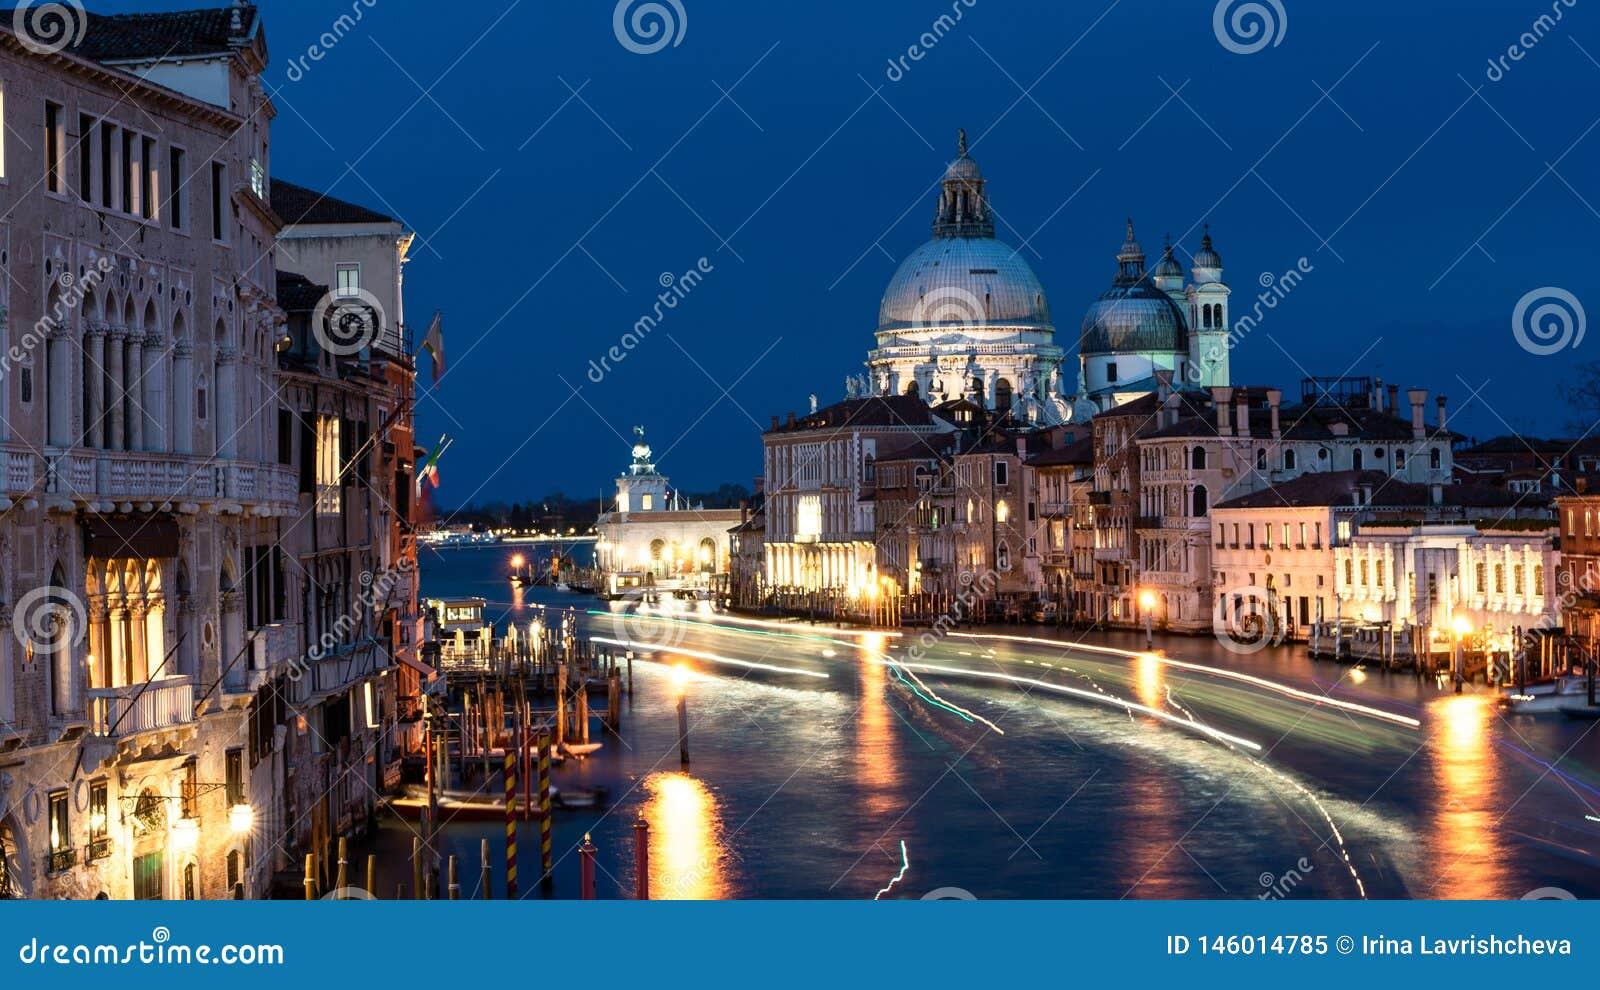 H?rlig sikt p? basilikadi Santa Maria della Salute i guld- aftonljus p? solnedg?ngen i Venedig, Italien